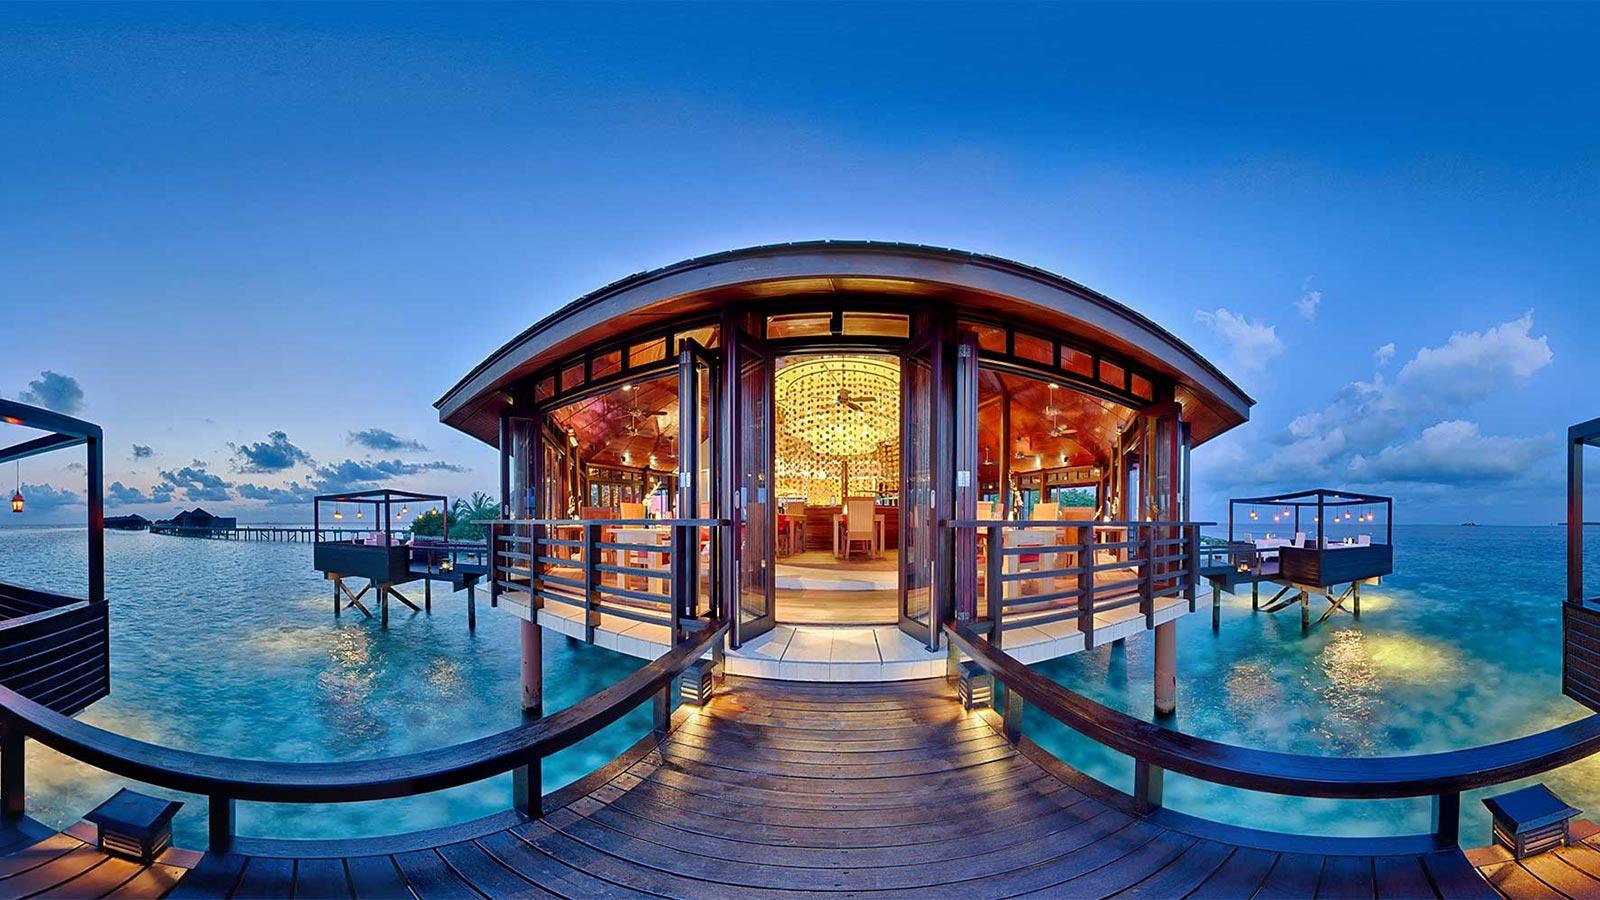 Tamarind Lily Beach Maldives 360 Tour